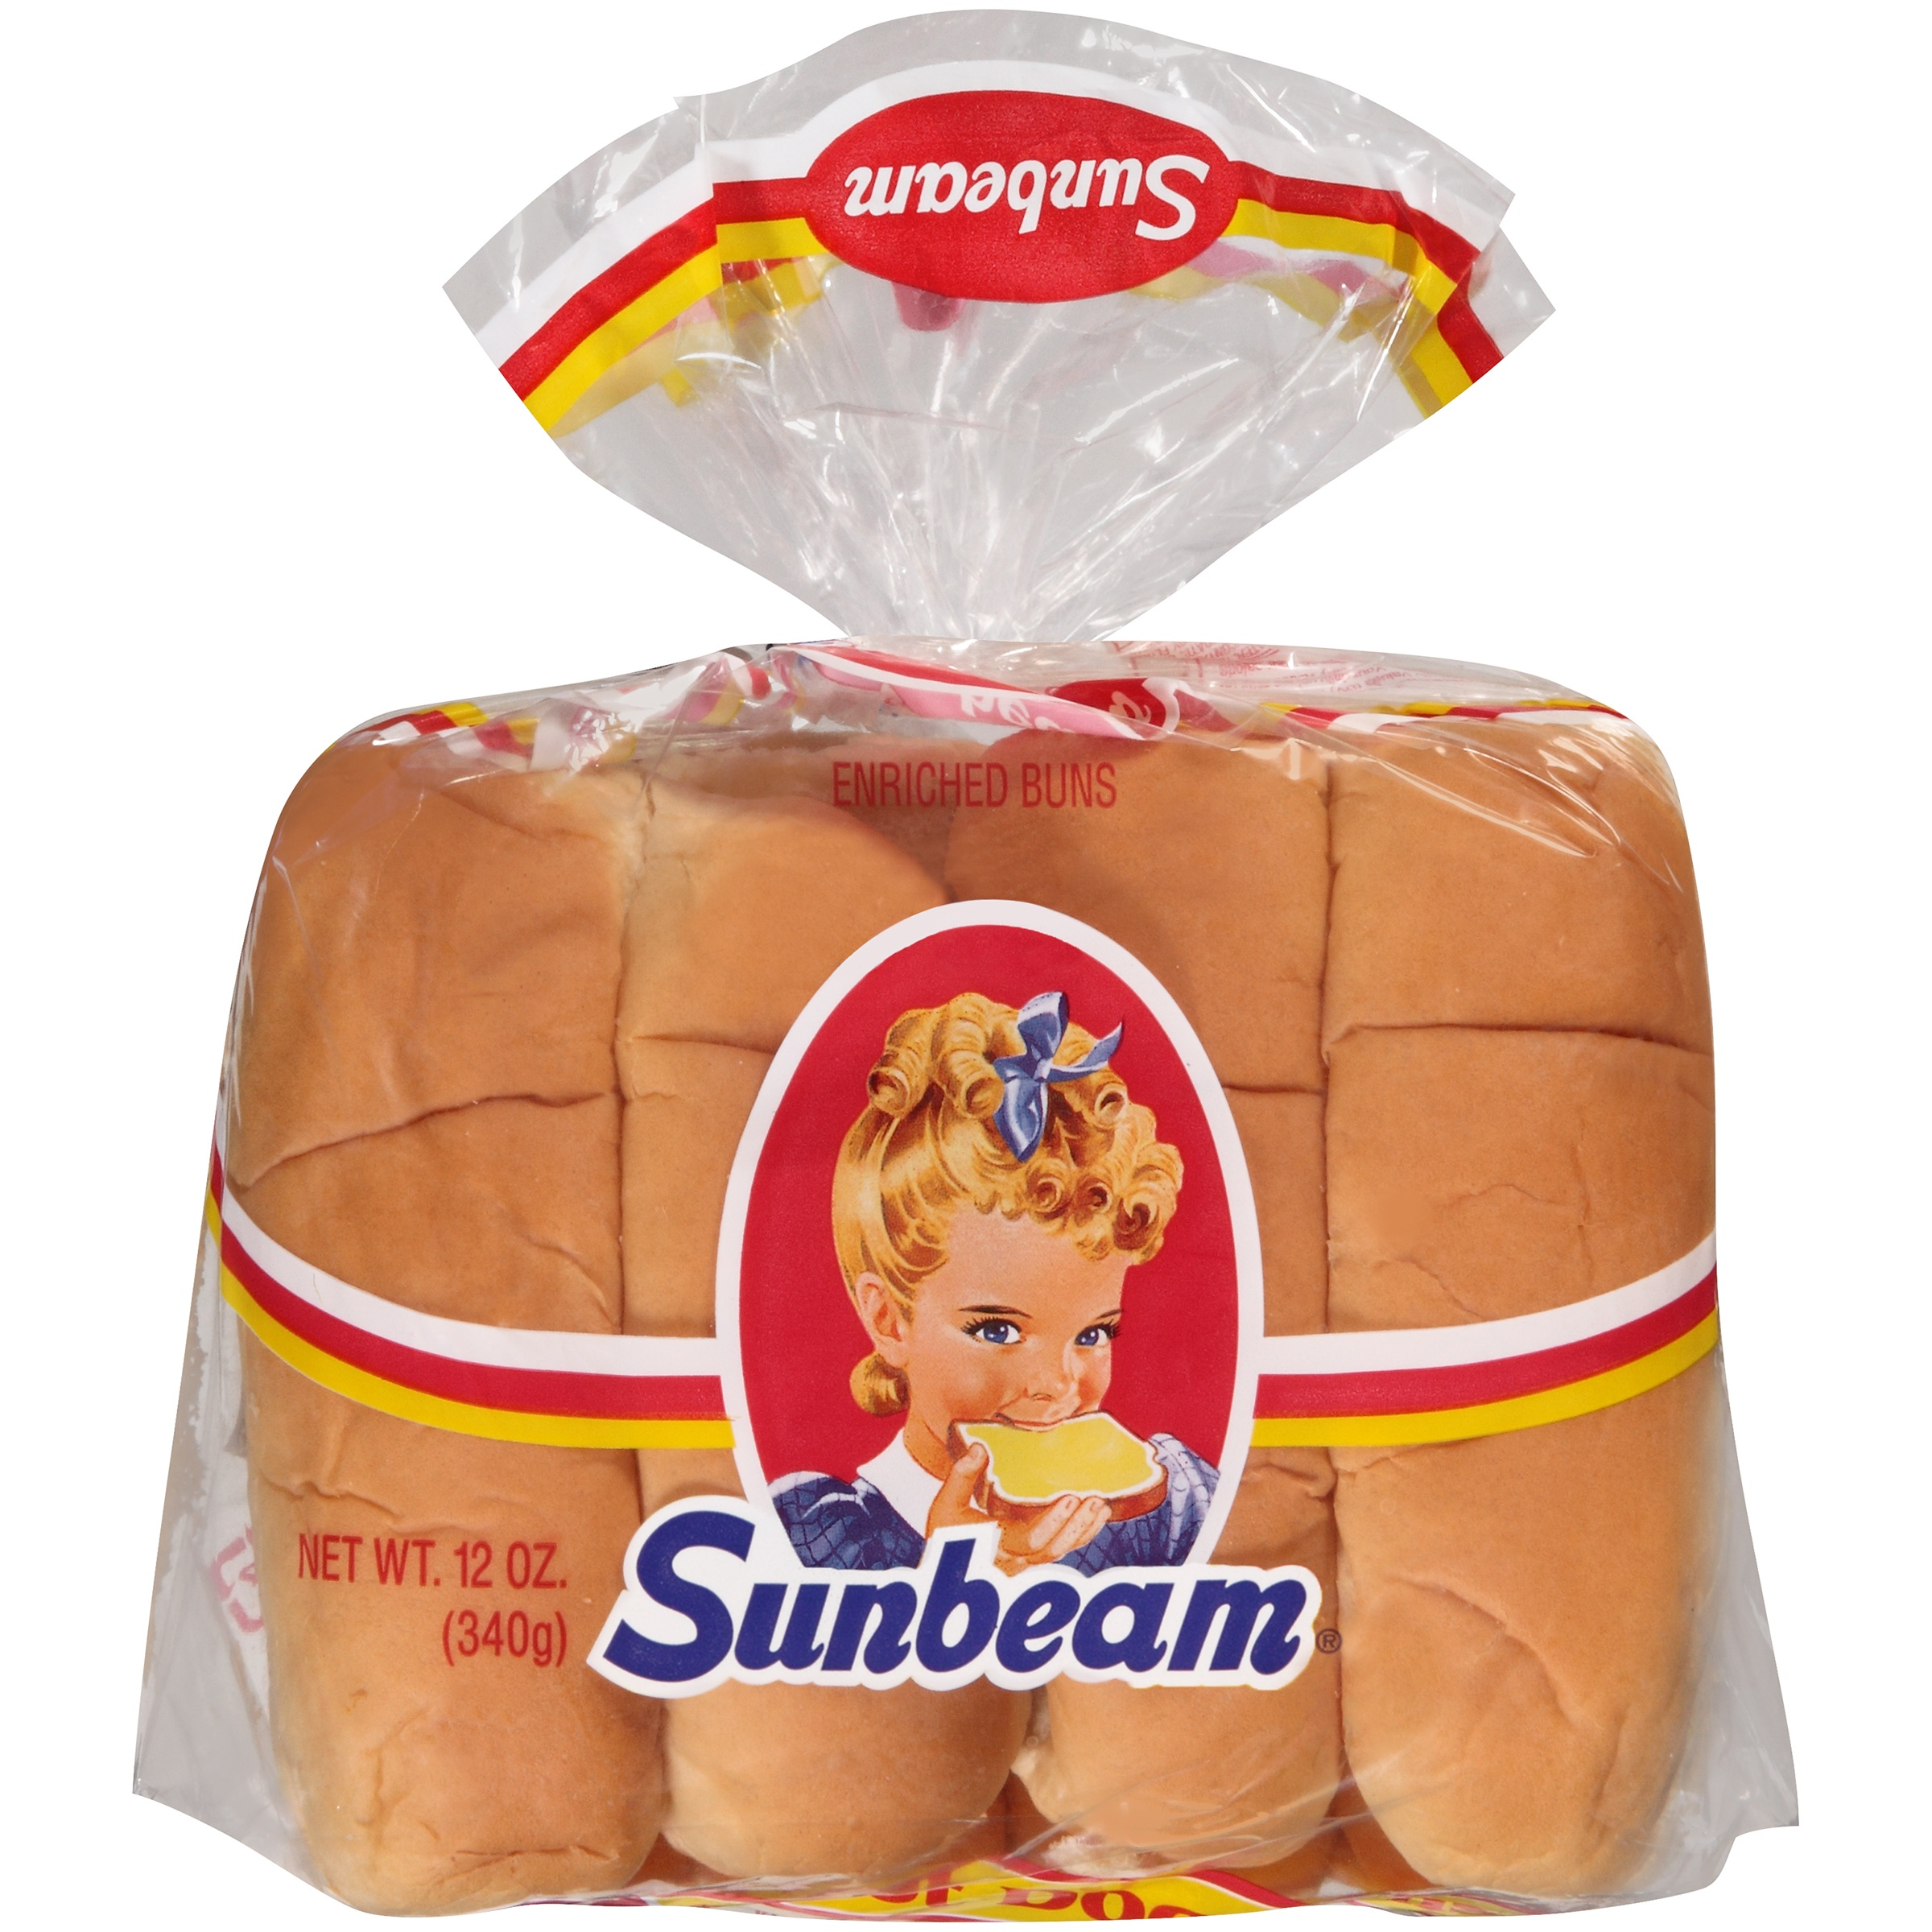 Sunbeam® Hot Dog Buns 8 ct Bag